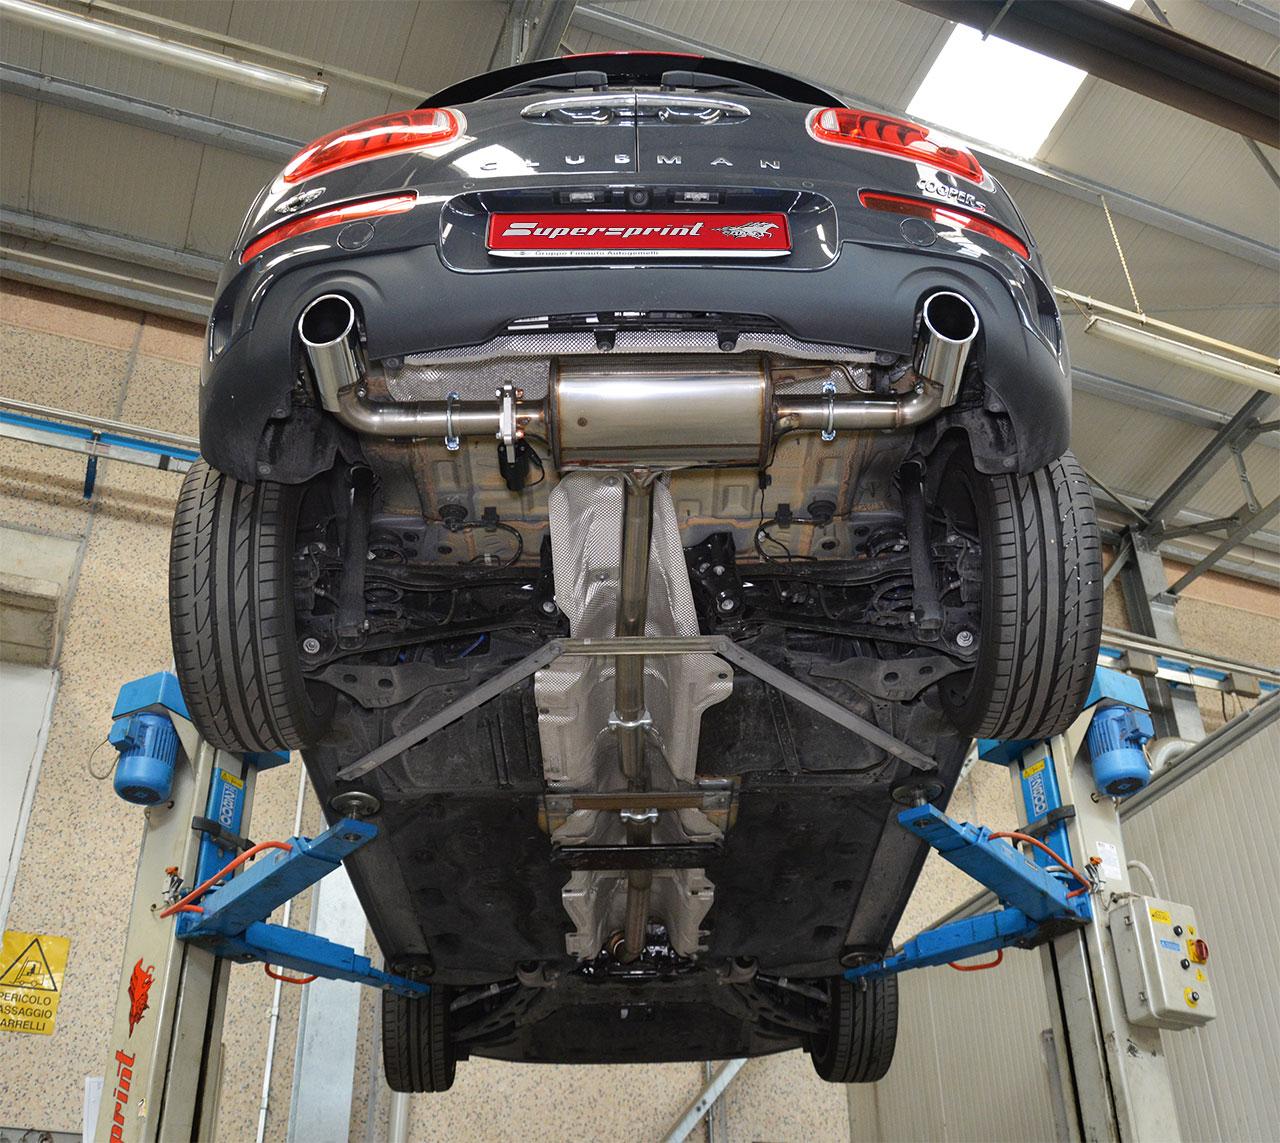 Mini Clubman Gets Supersprint Exhaust Reveals Strange